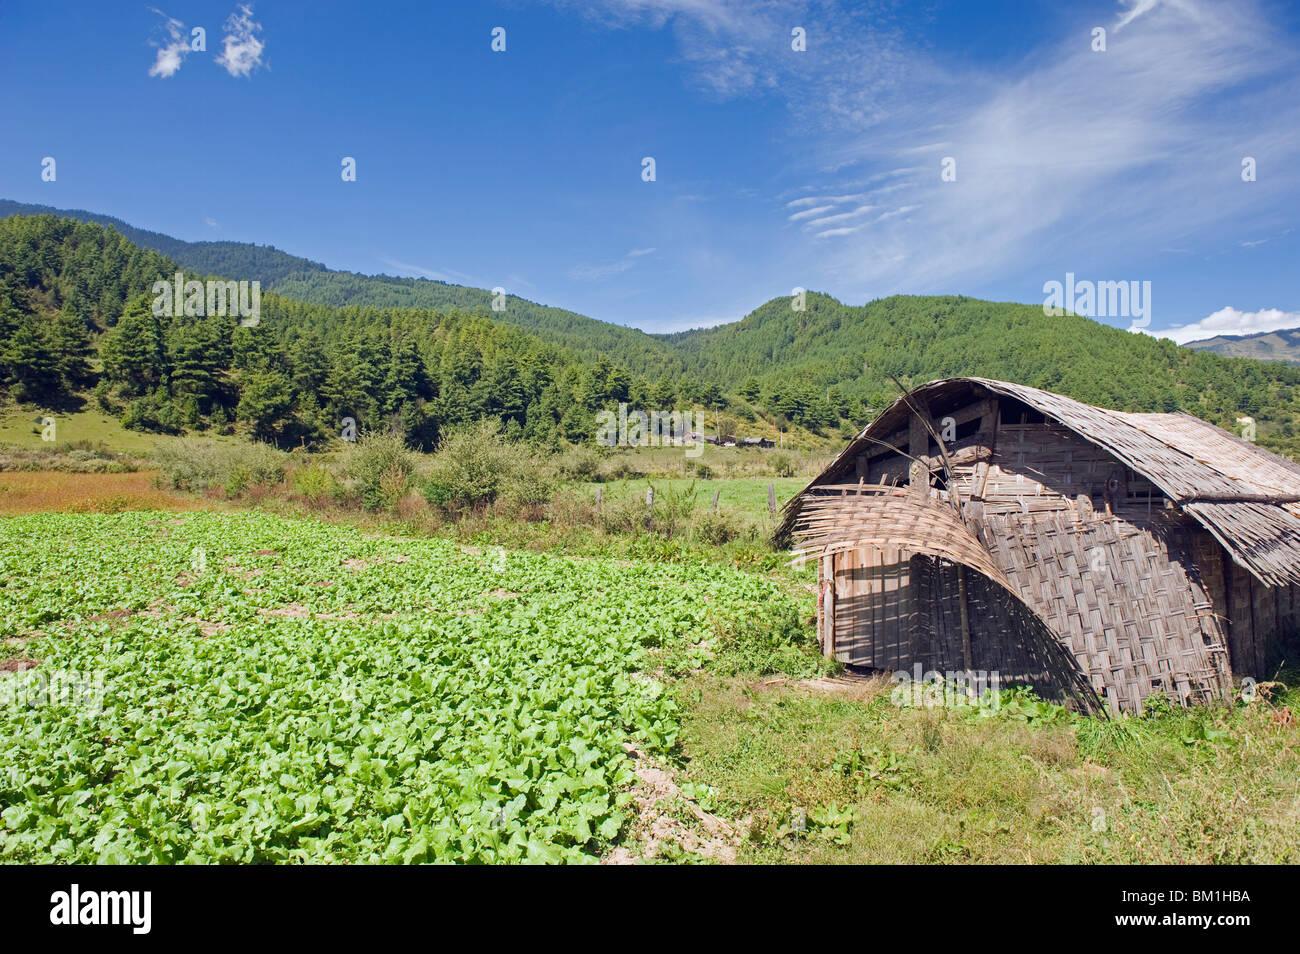 Bamboo hut, Bumthang, Chokor Valley, Bhutan, Asia - Stock Image